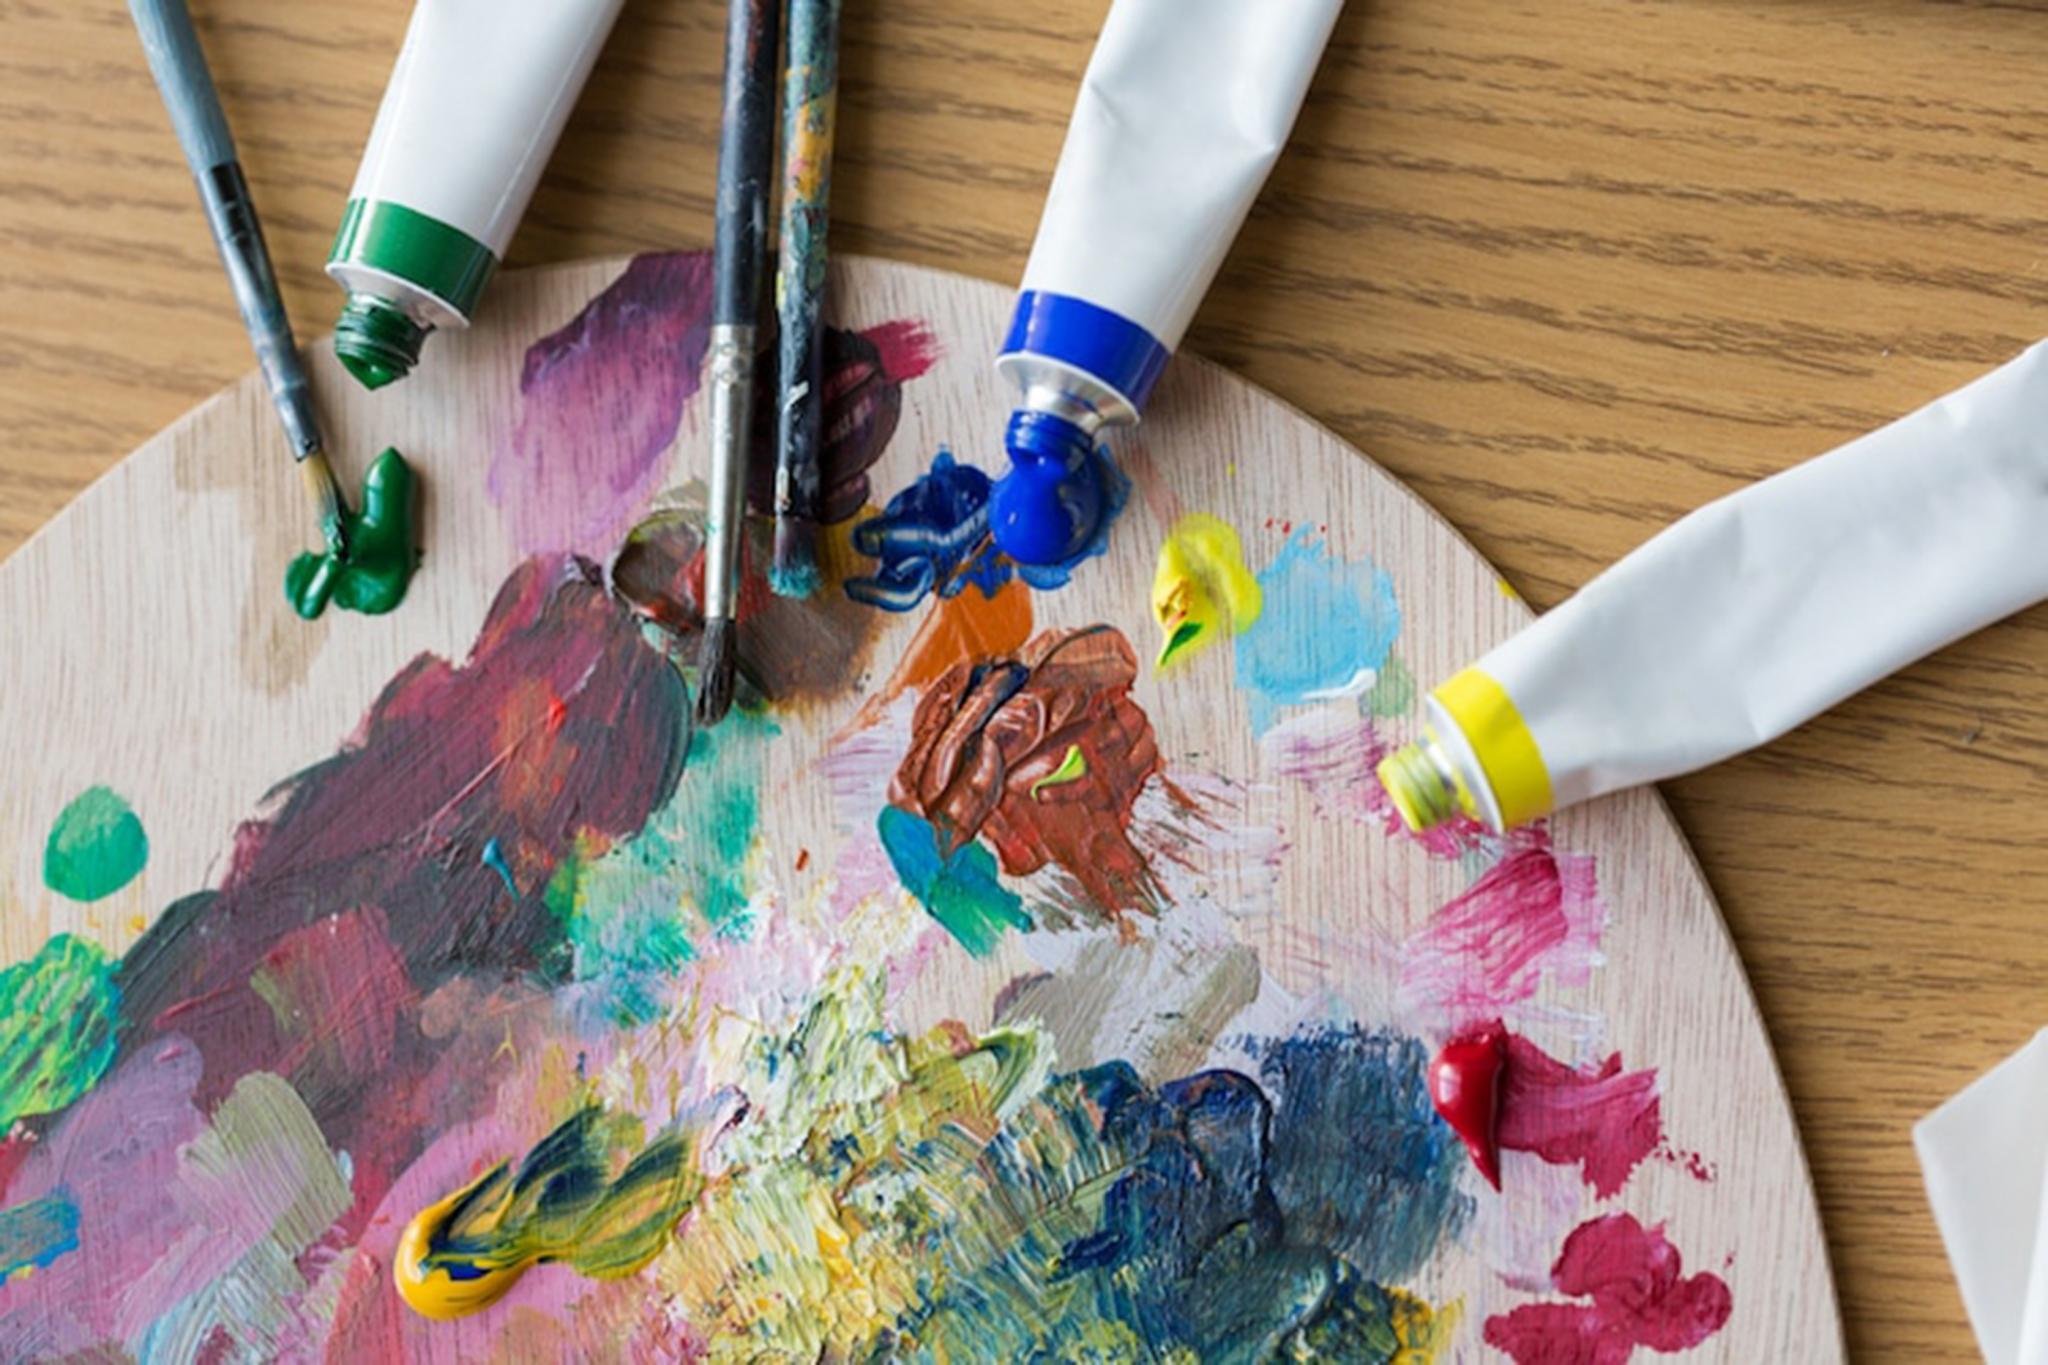 Paint with Acrylics | MSAD 52 Adult & Community Education